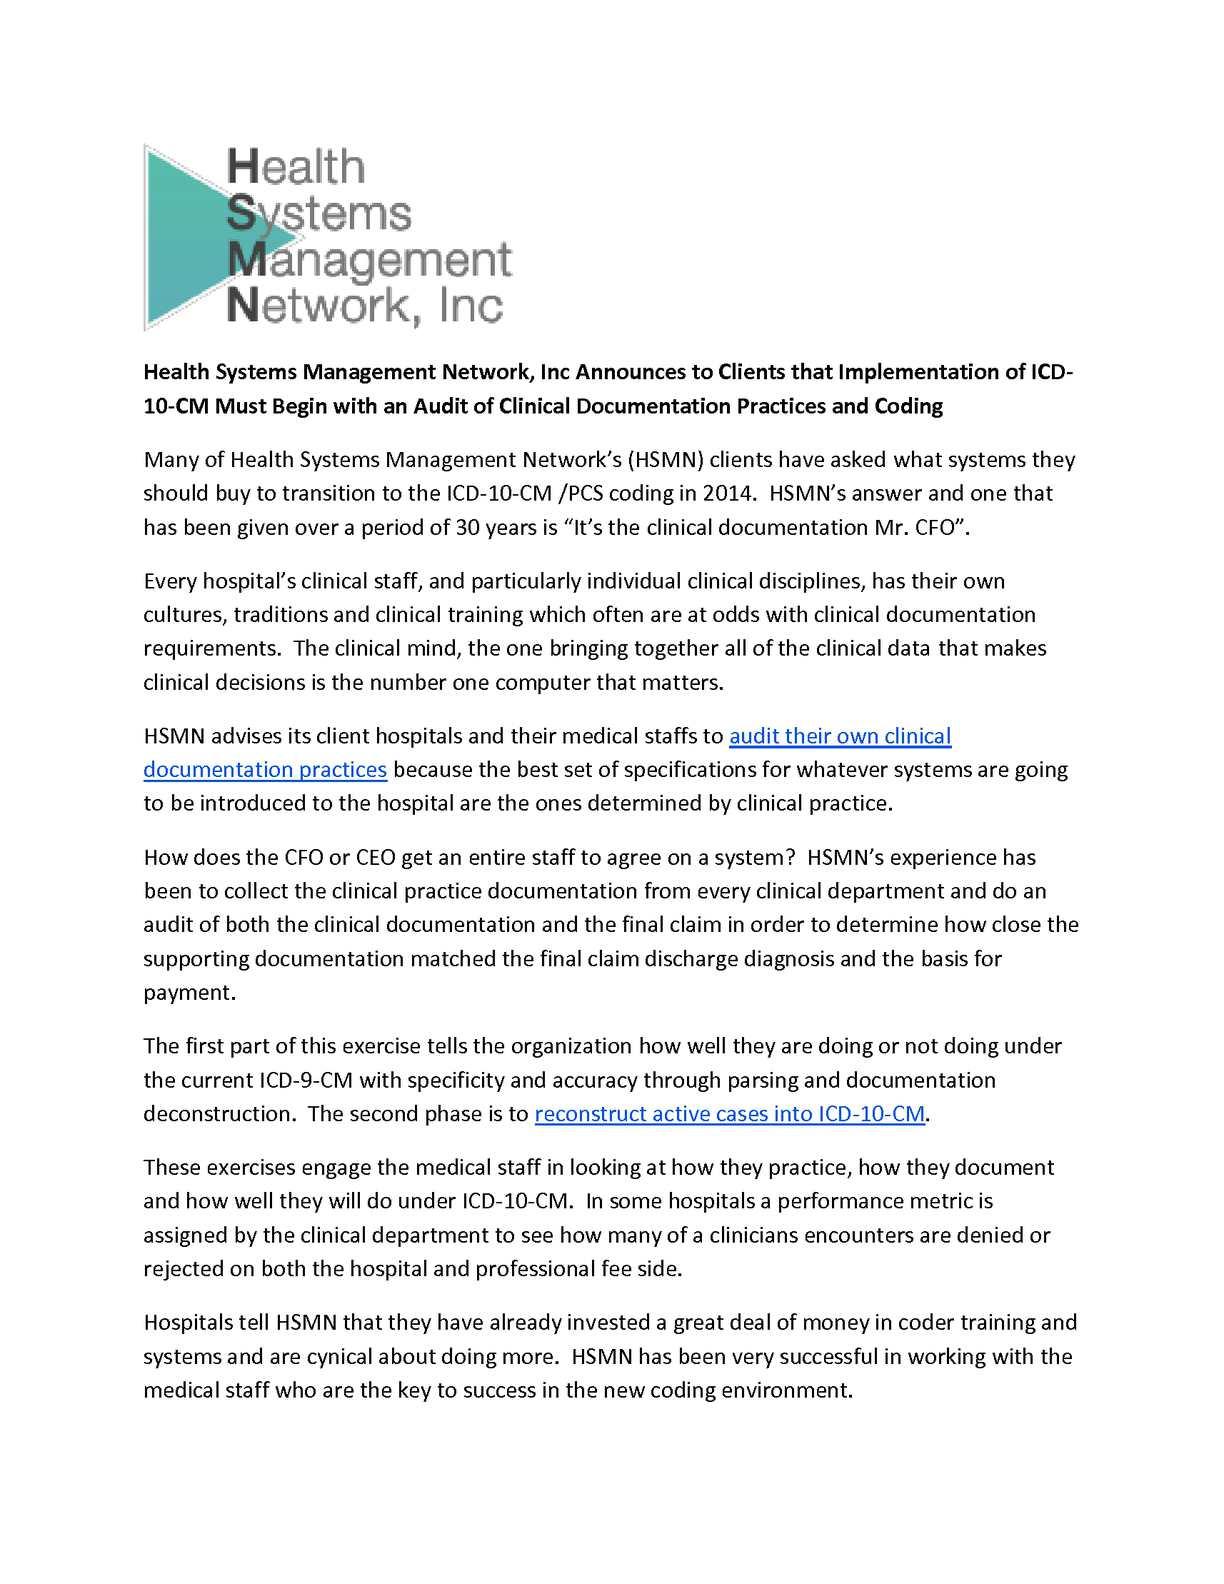 Calamo Health Systems Management Network Inc Announces To